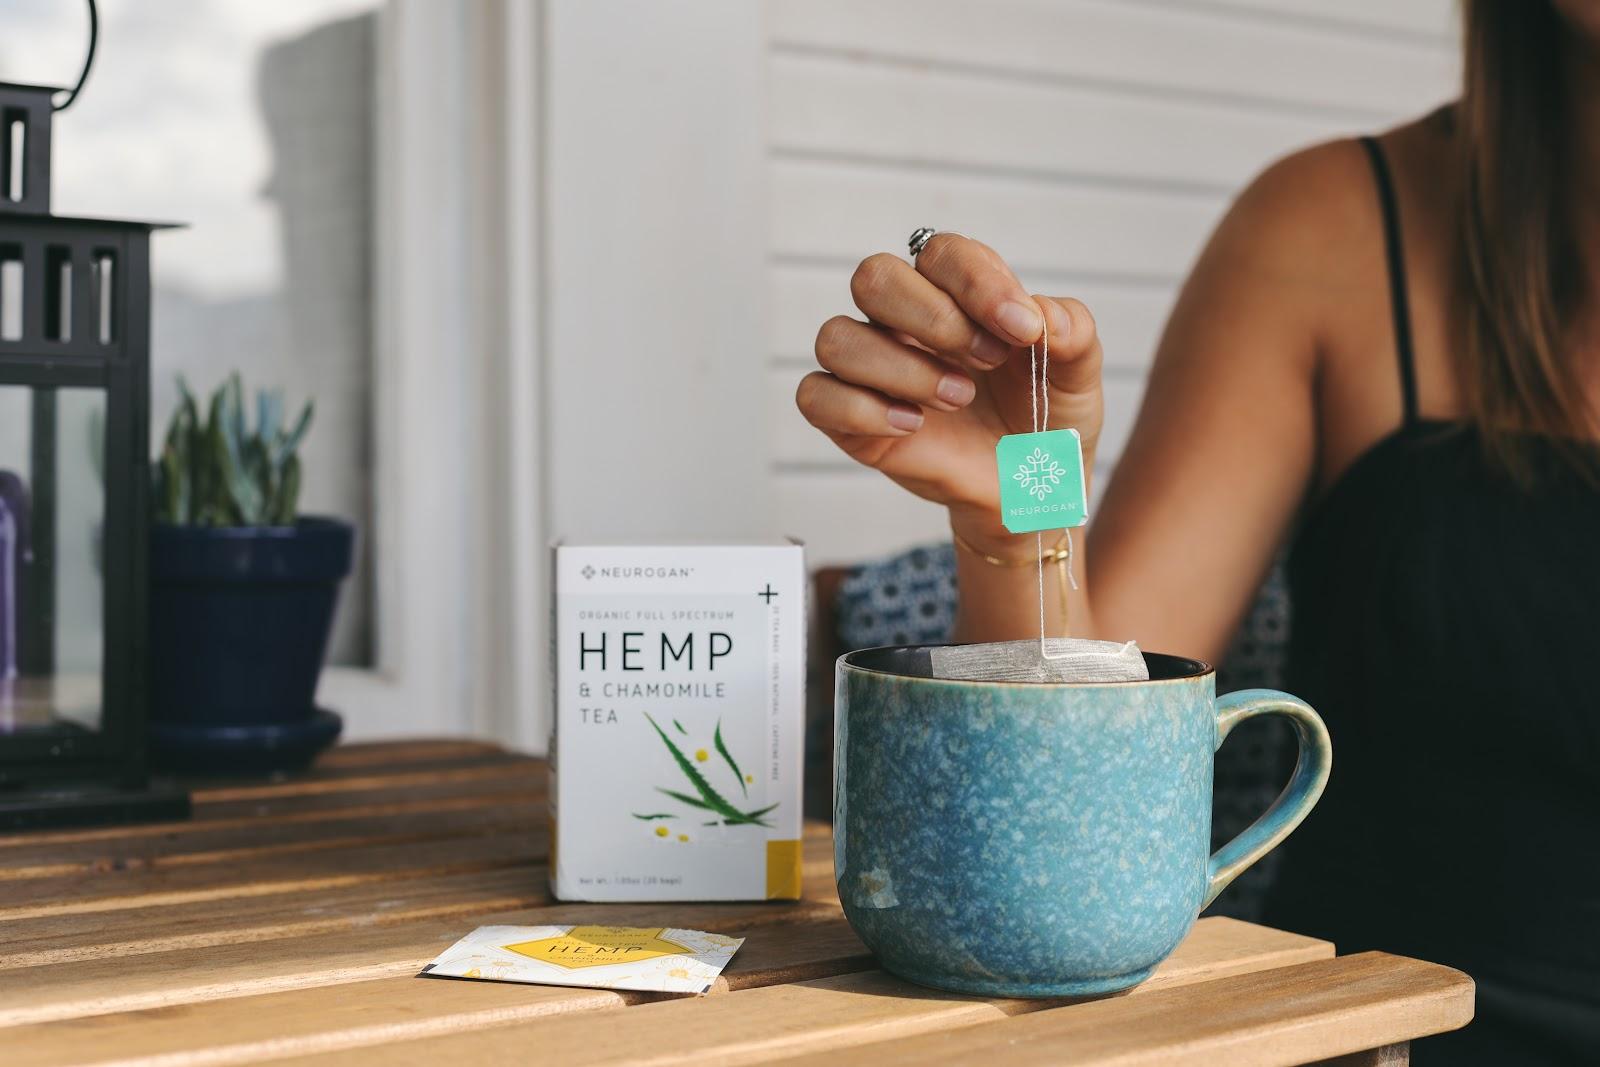 neurogan cbd tea with chamomile and hemp